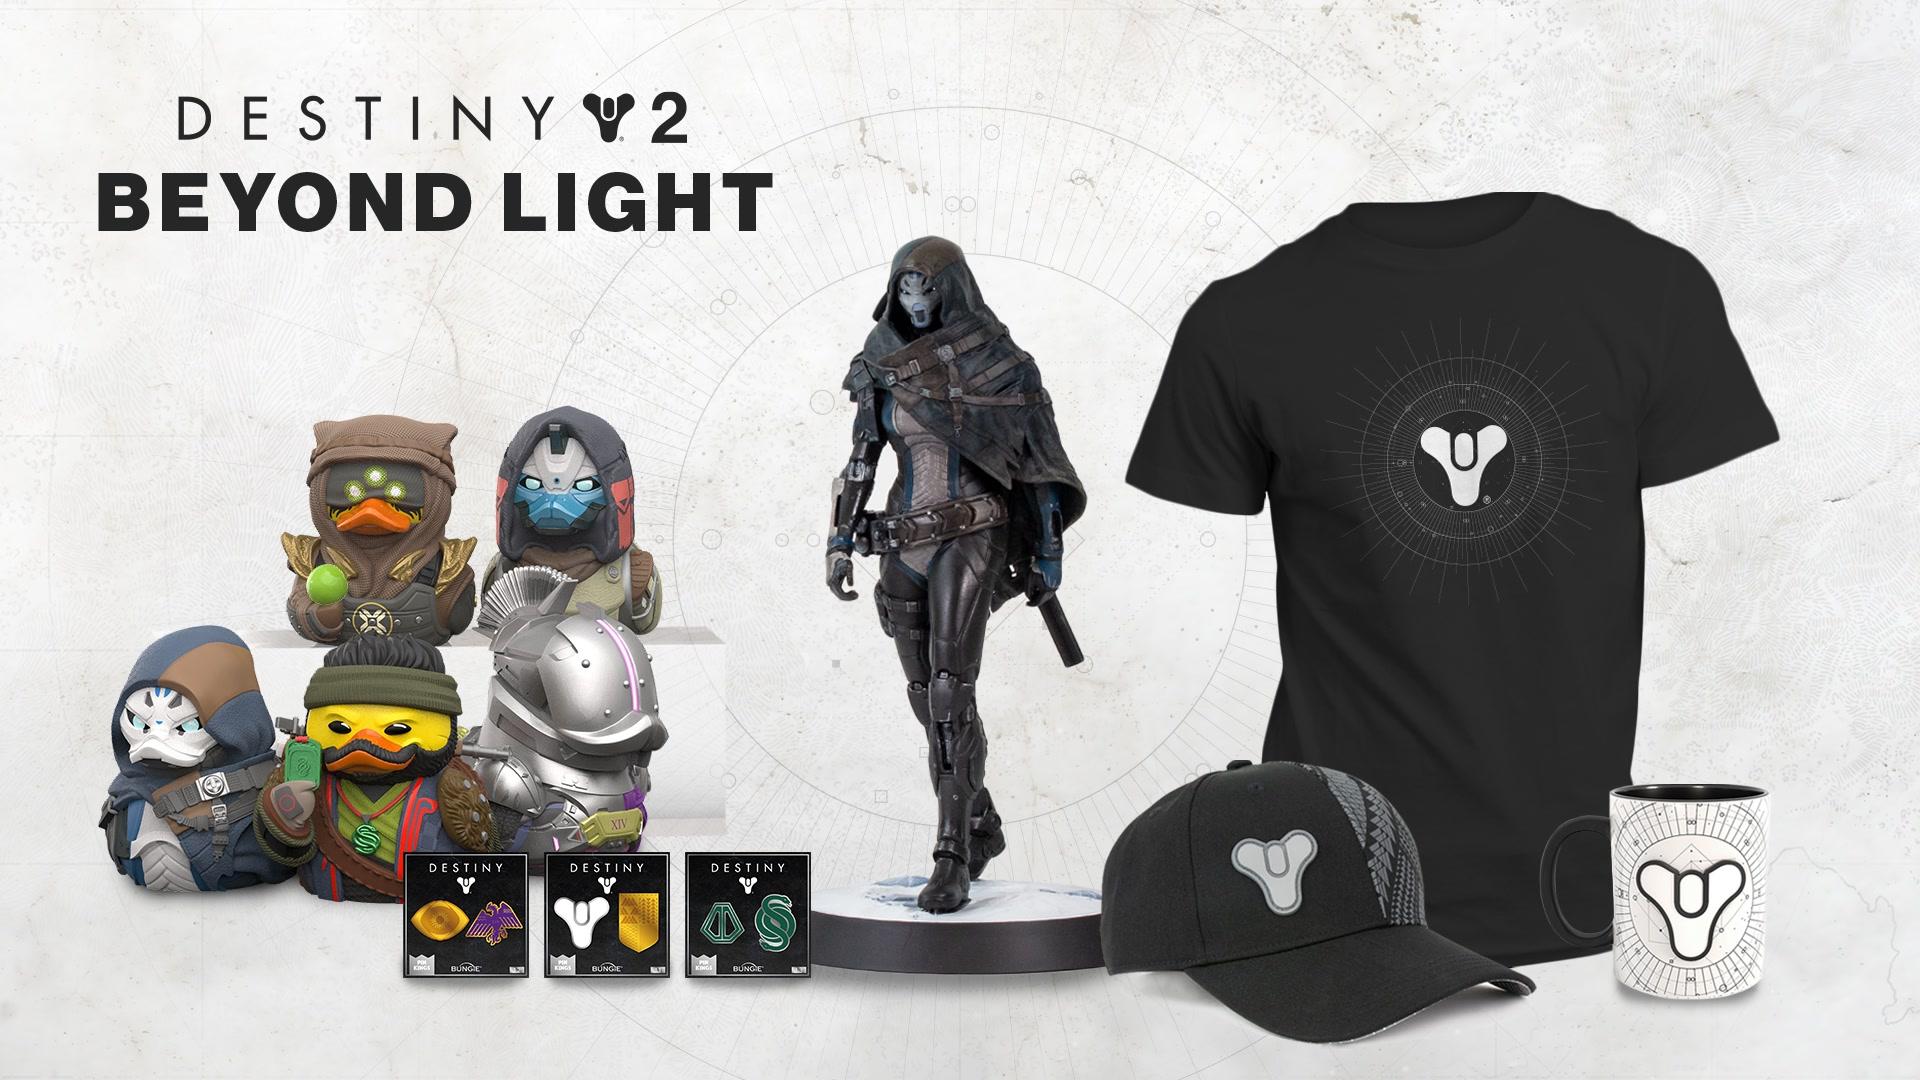 Numskull Destiny 2 Beyond Light